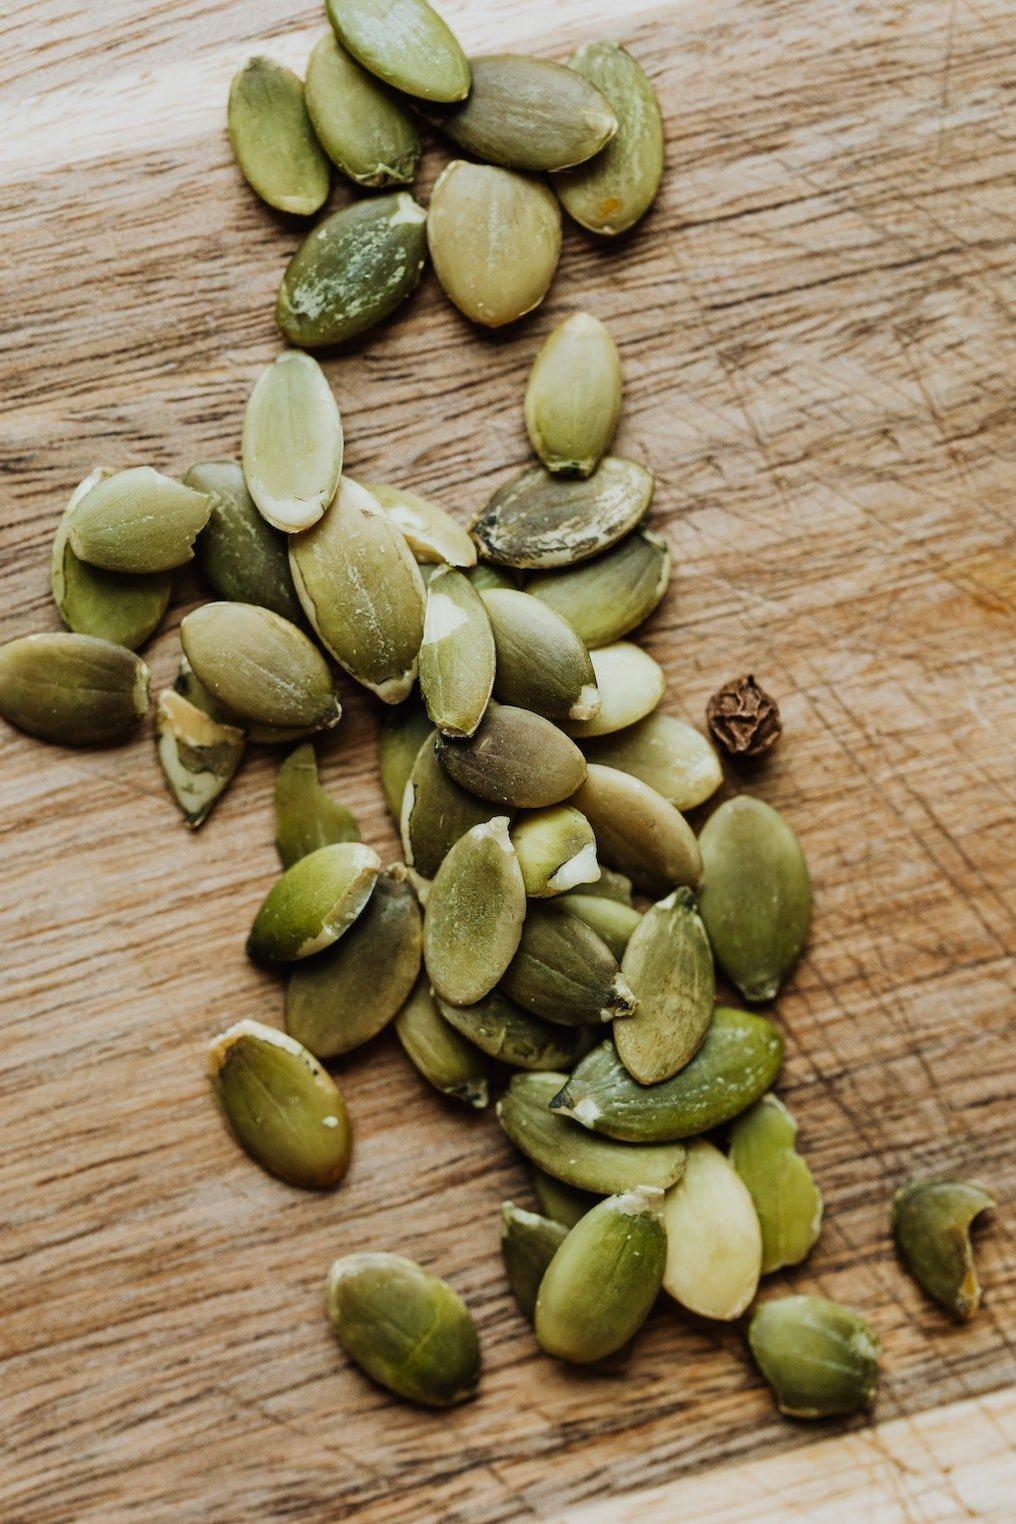 Pumpkin seeds, pepitas, raw, unsalted, nutritious, vitamins, minerals, healthy